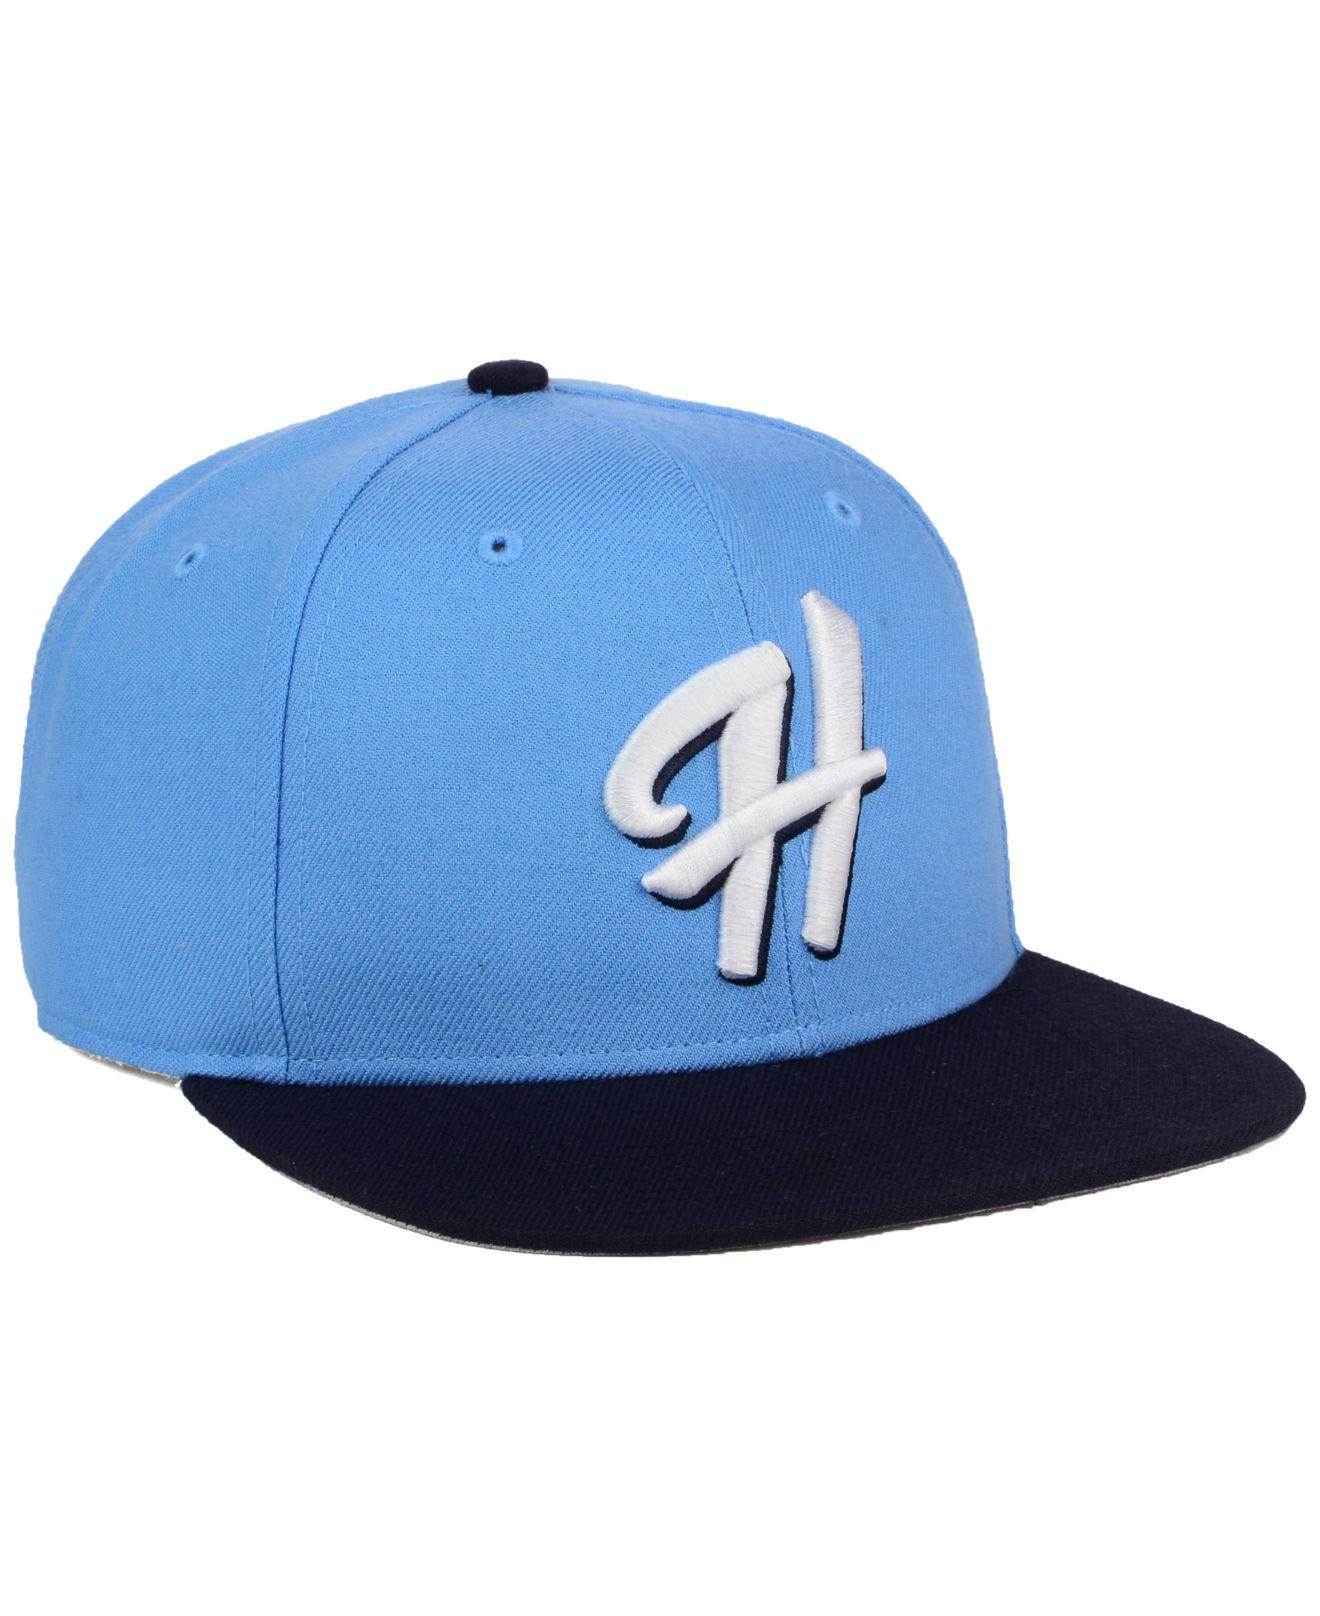 quality design 96ff1 6dcaa Lyst - 47 Brand Hillsboro Hops Shot Snapback Cap in Blue for Men